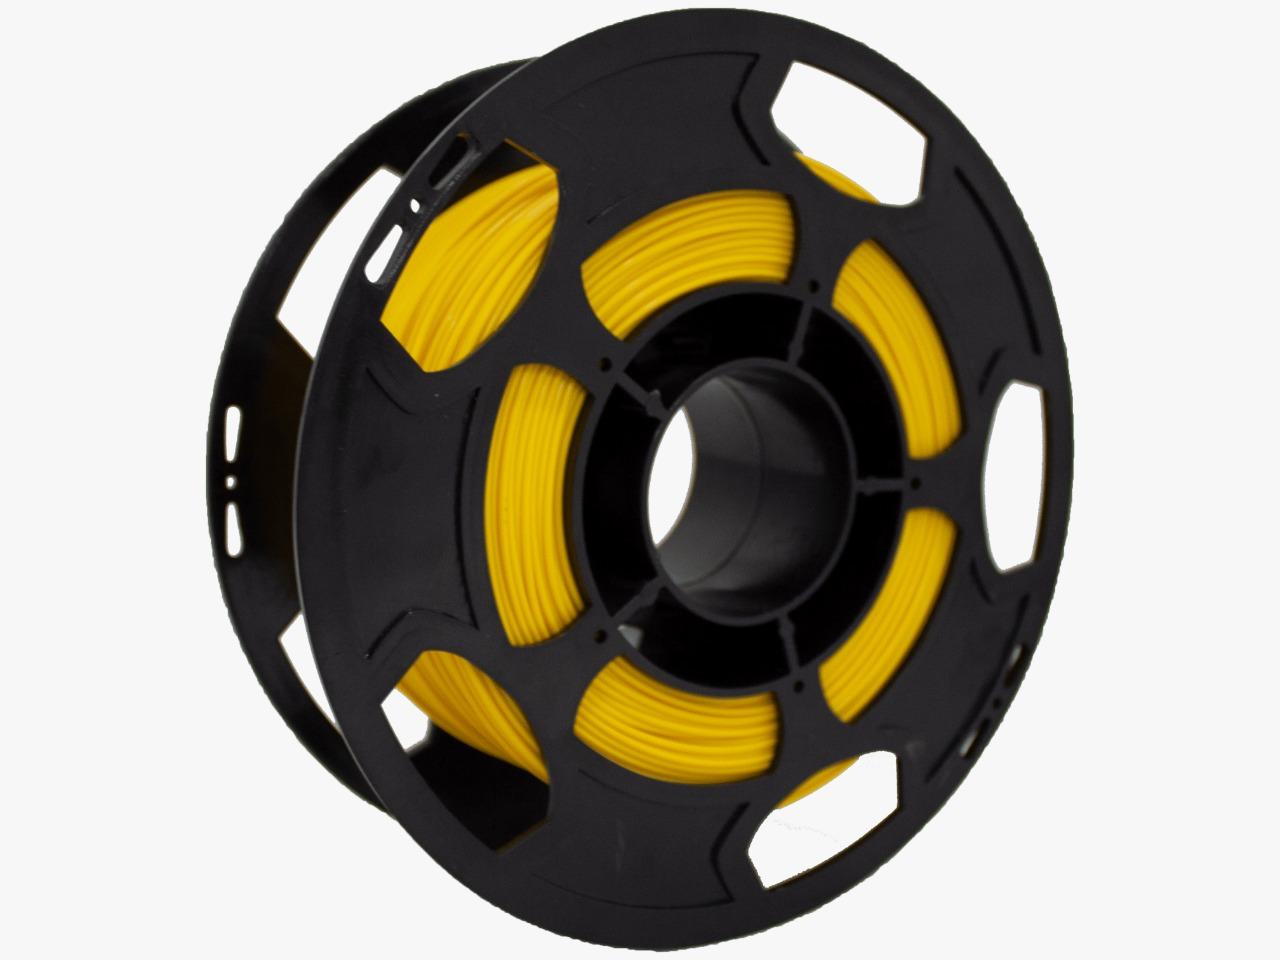 Filamento PLA - Amarelo - 3D Lab - 1.75mm - 500g